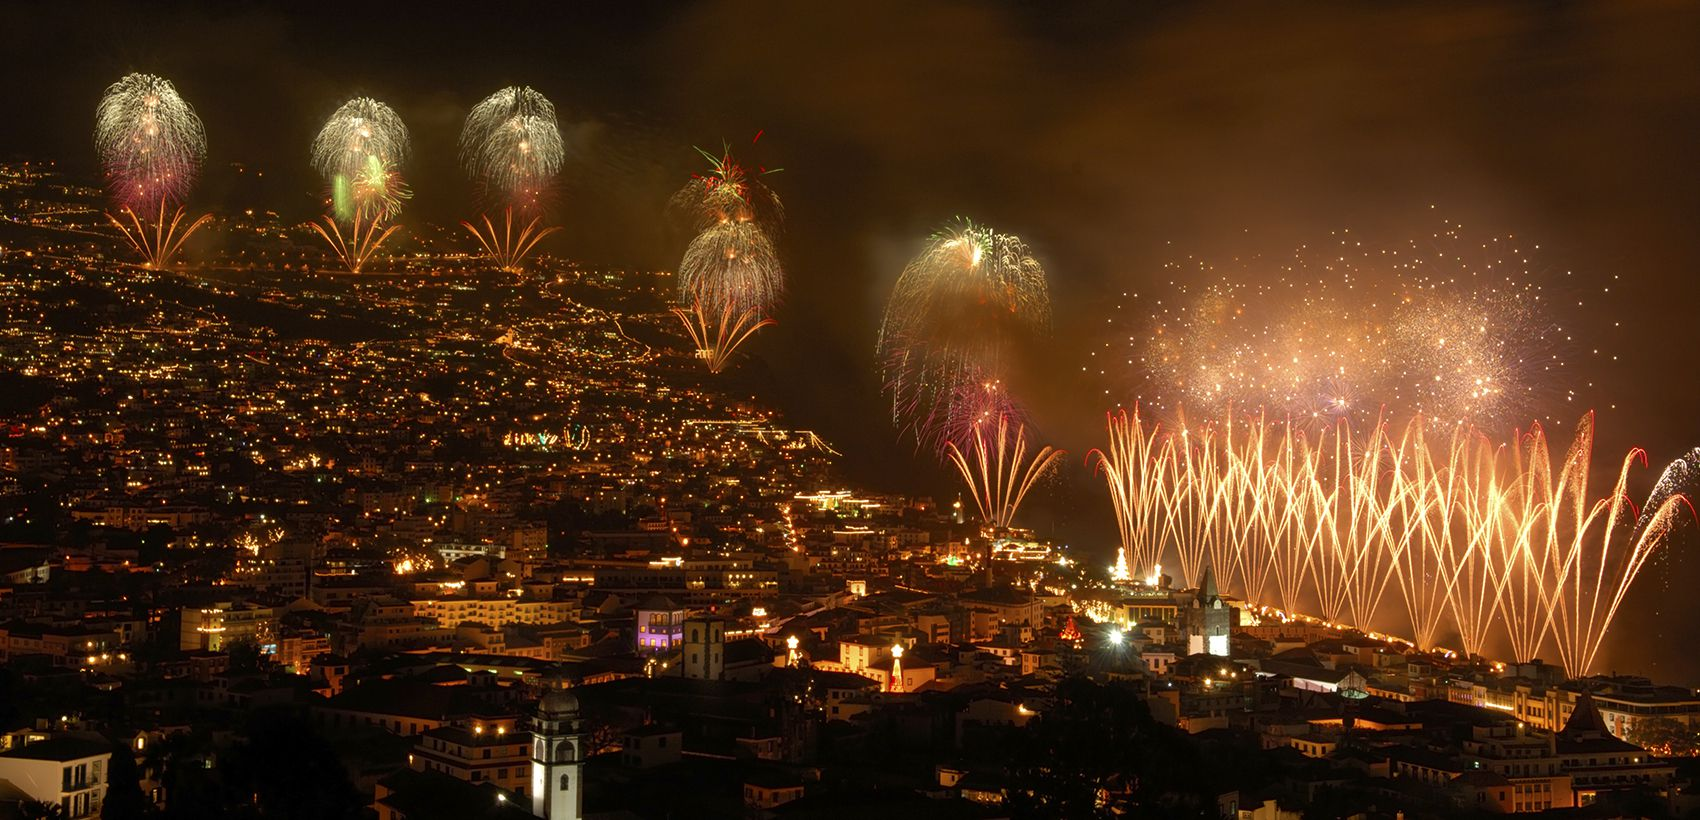 Lisboa/Porto» Funchal: RÉVEILLON |VOO ESPECIAL| TAP|4 Noites